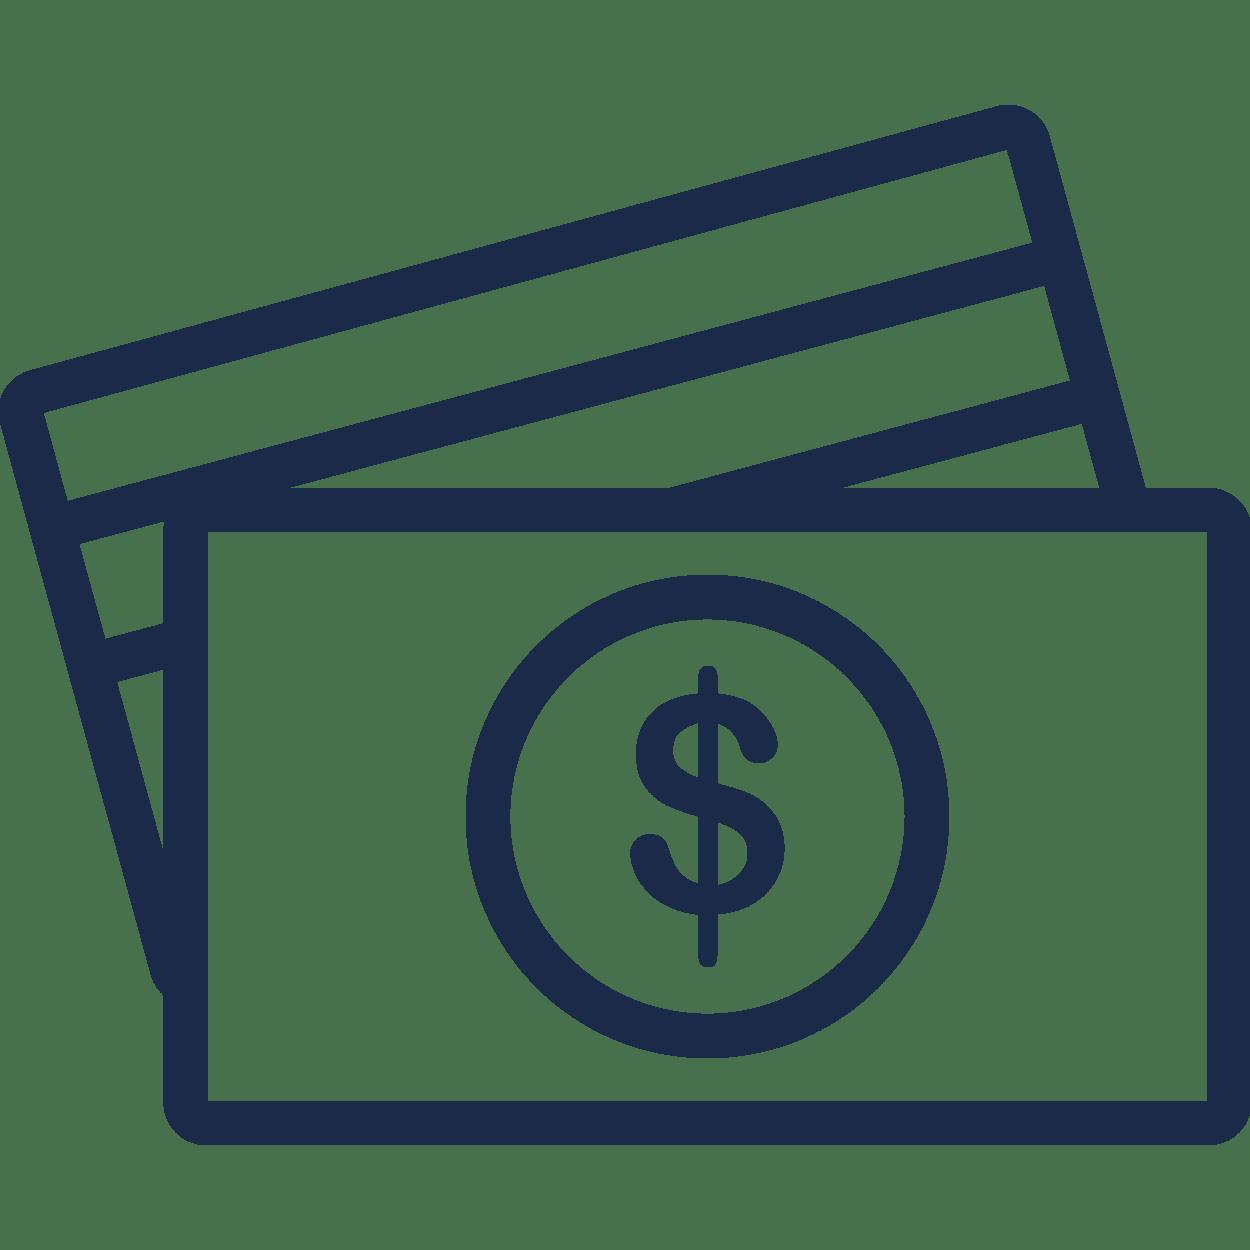 Betalningsmetoder icon